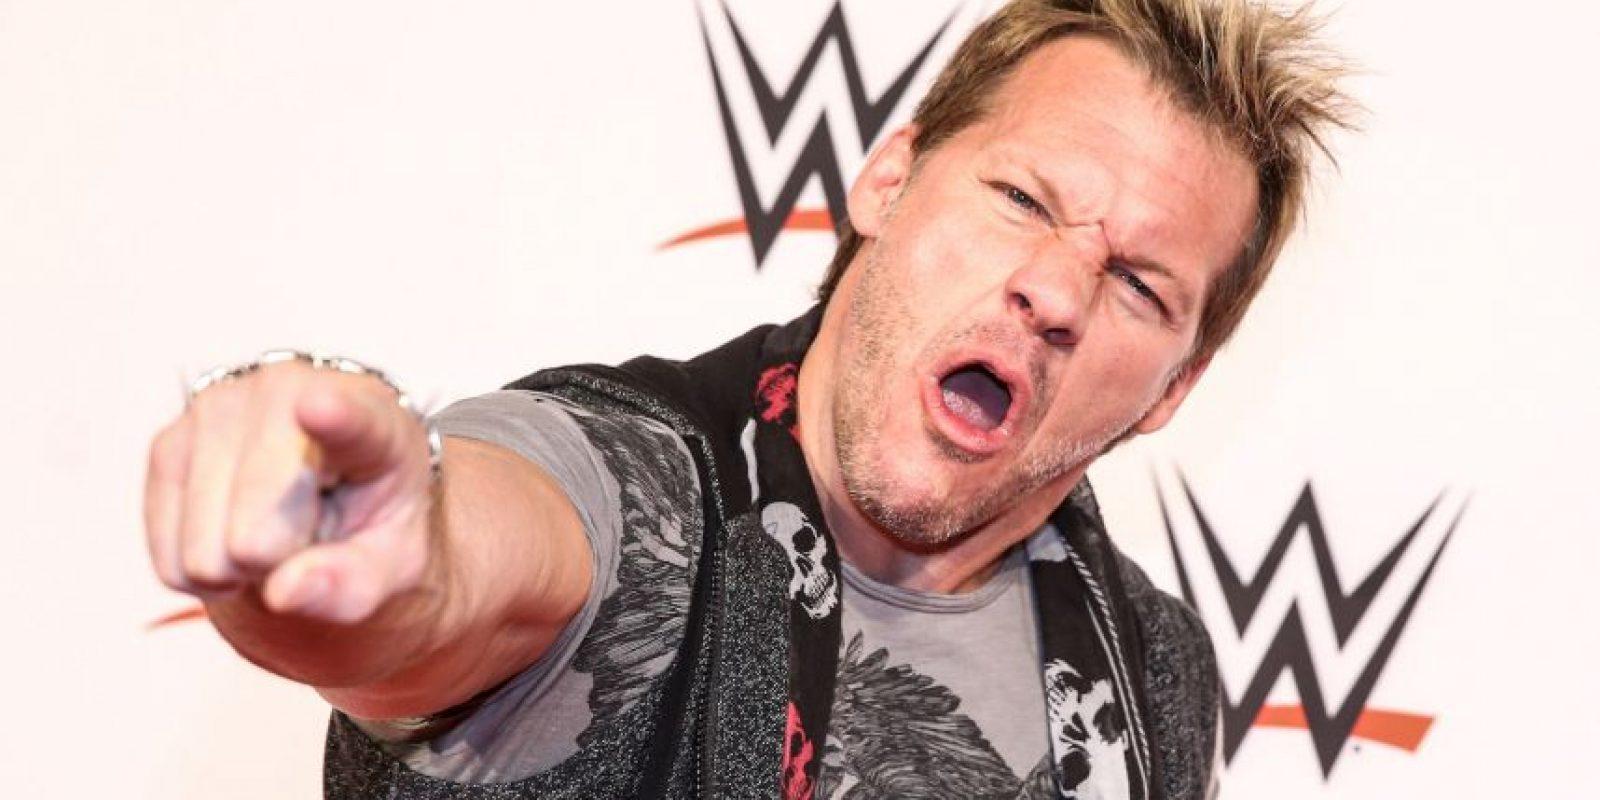 7. Chris Jericho Foto:WWE